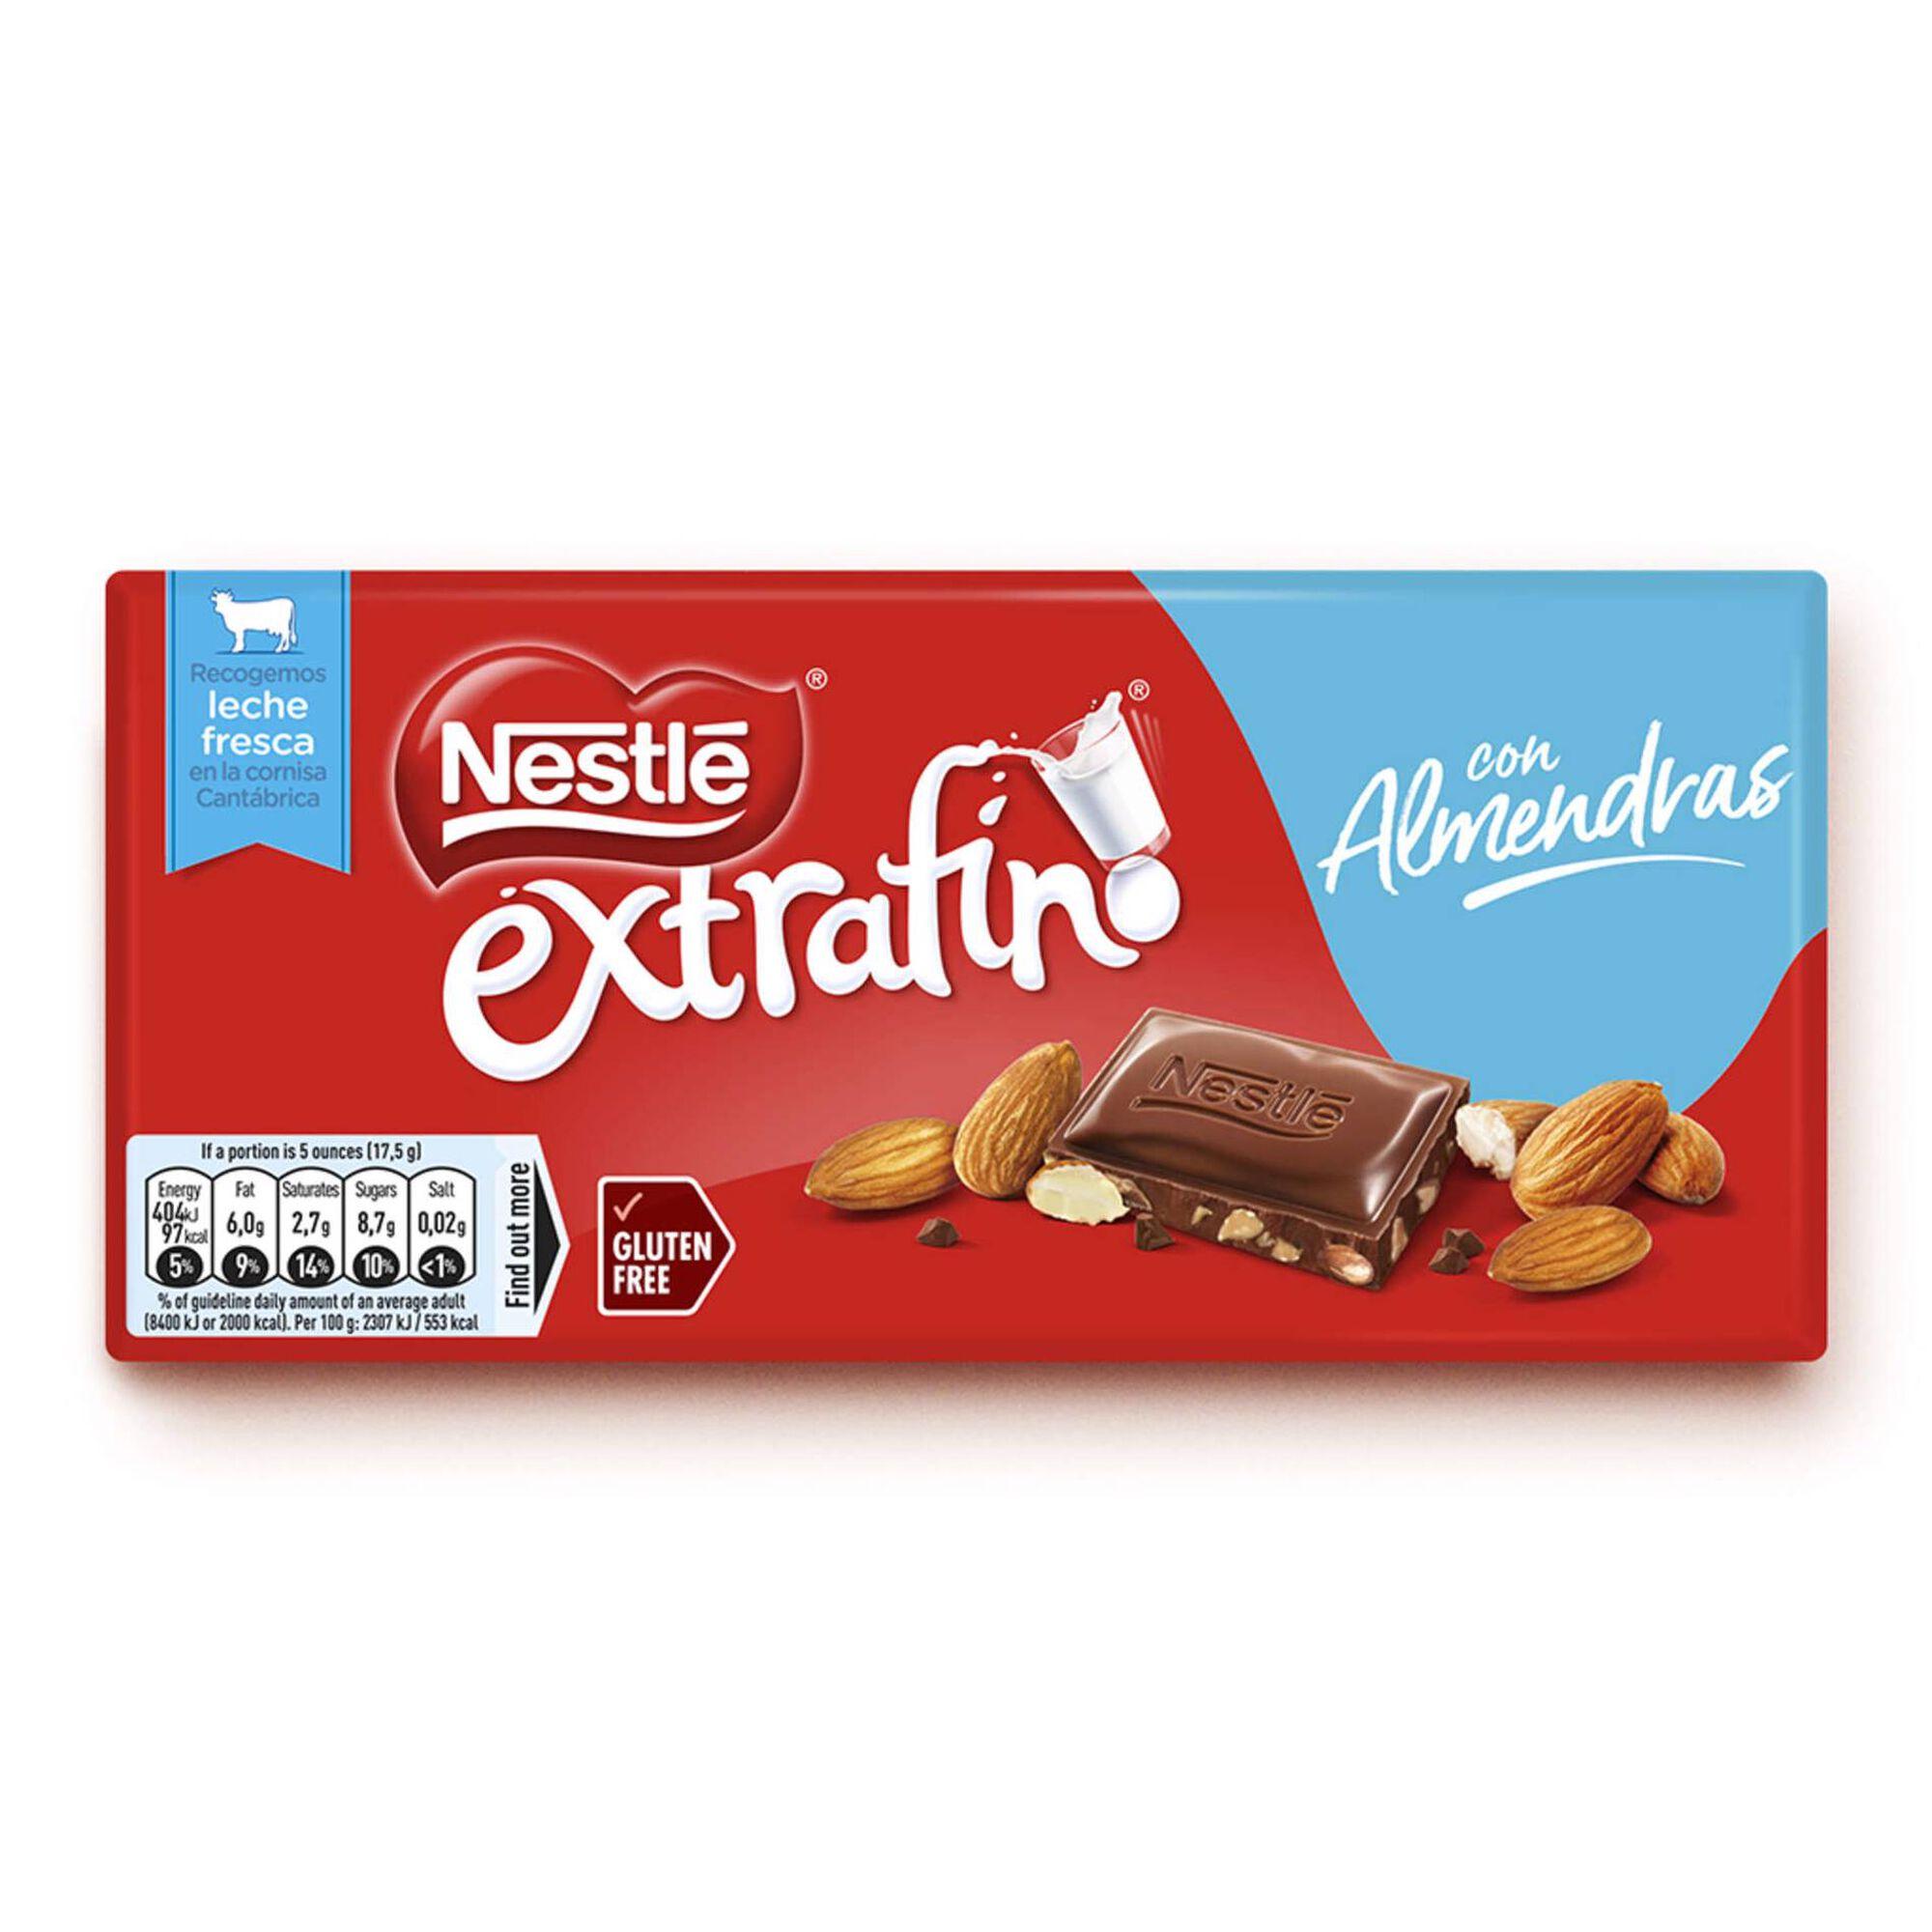 Tablete de Chocolate de Leite com Amêndoa Extrafino sem Glúten